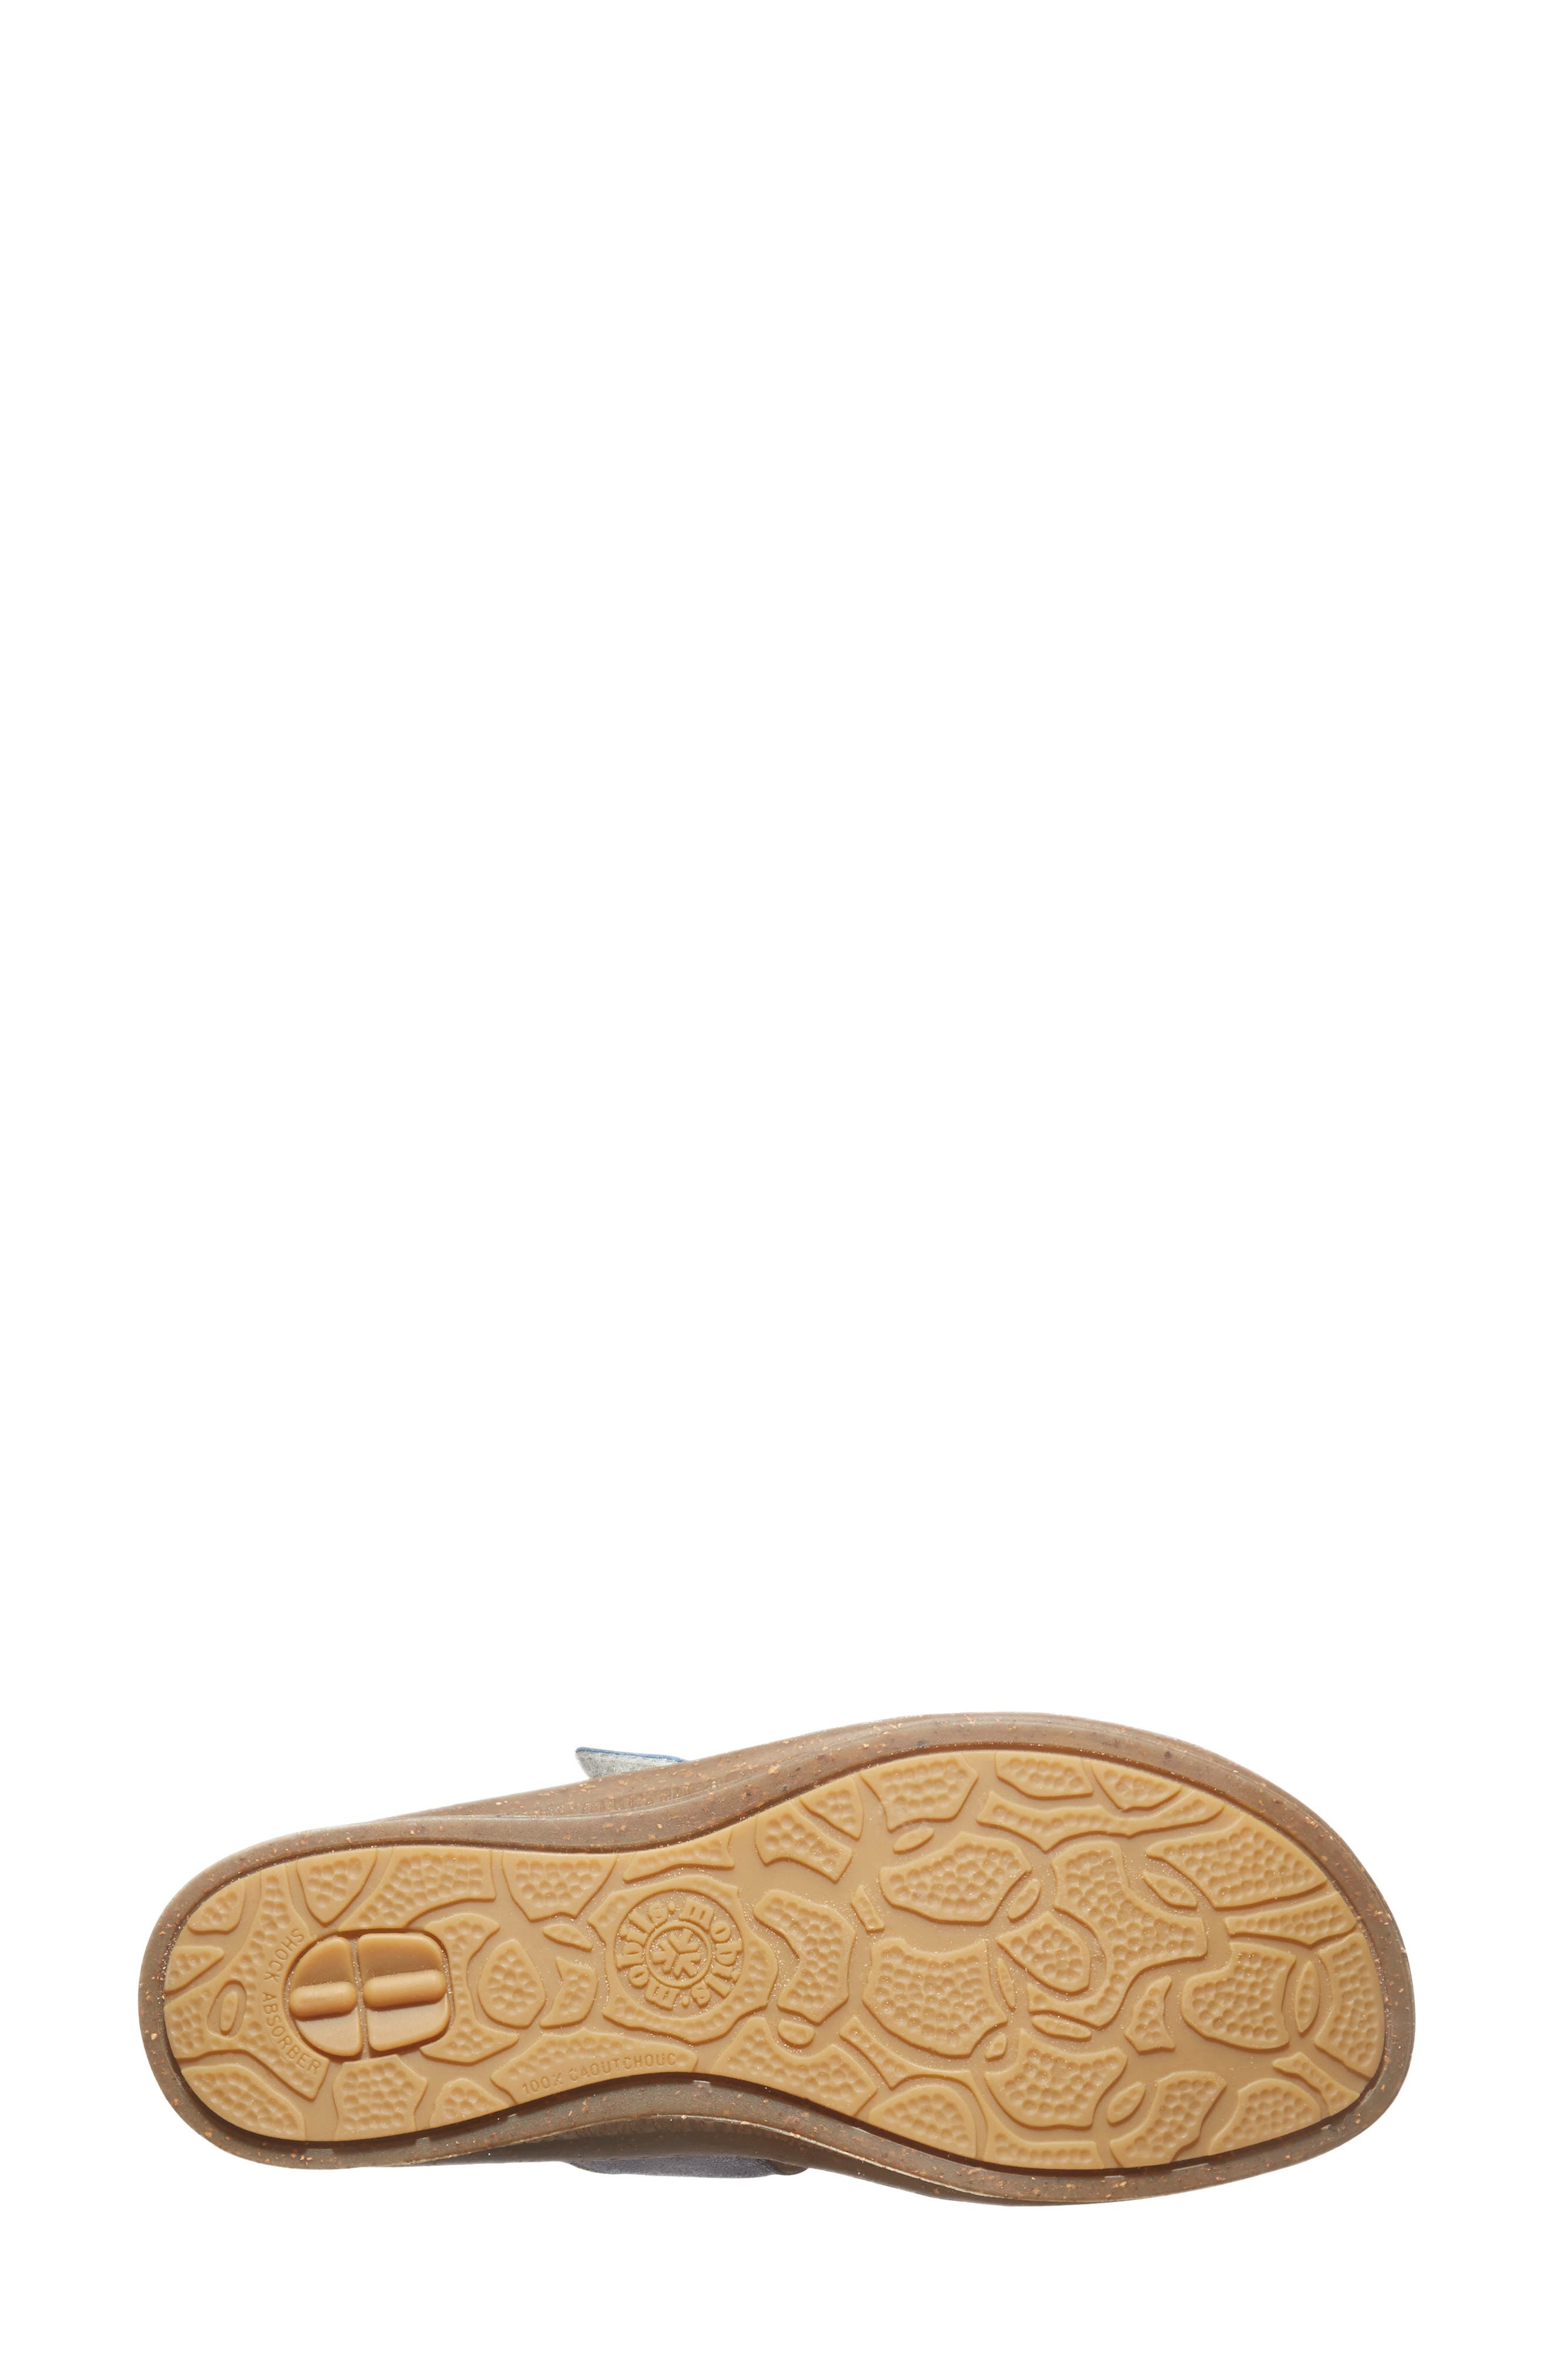 'Bregalia' Metallic Leather Sandal,                             Alternate thumbnail 3, color,                             400